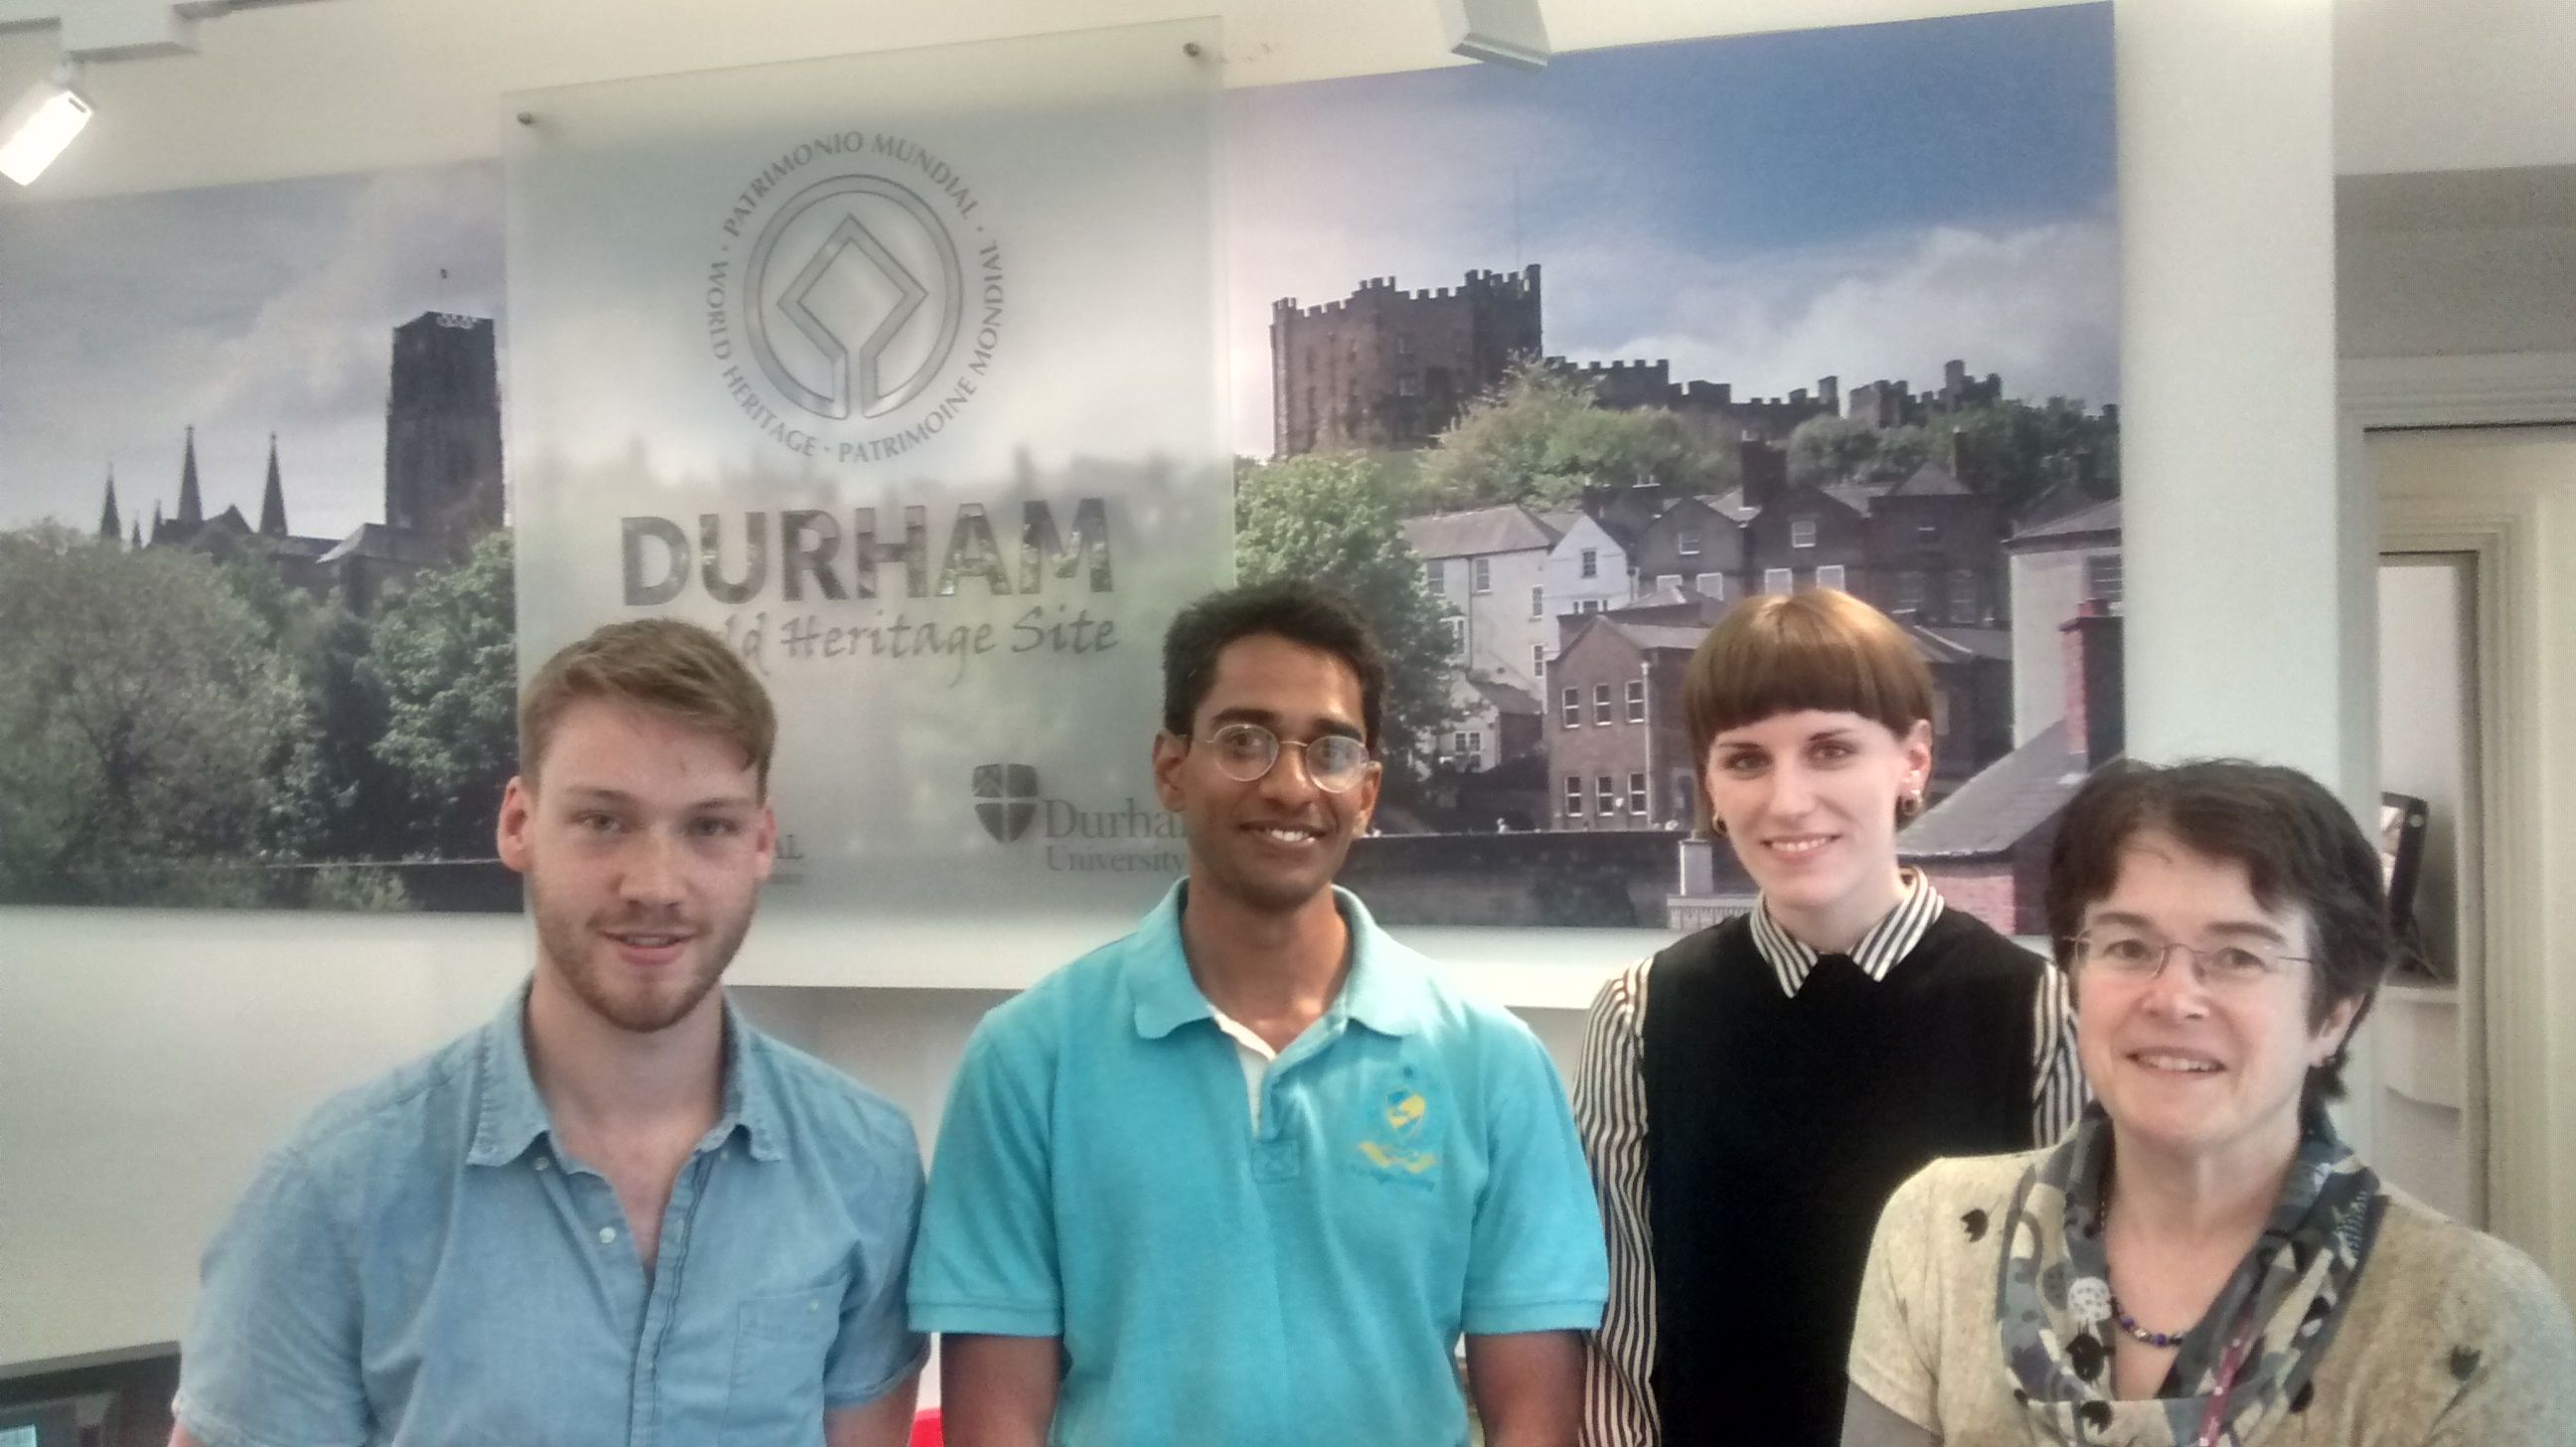 Met the WHS coordinator at Durham